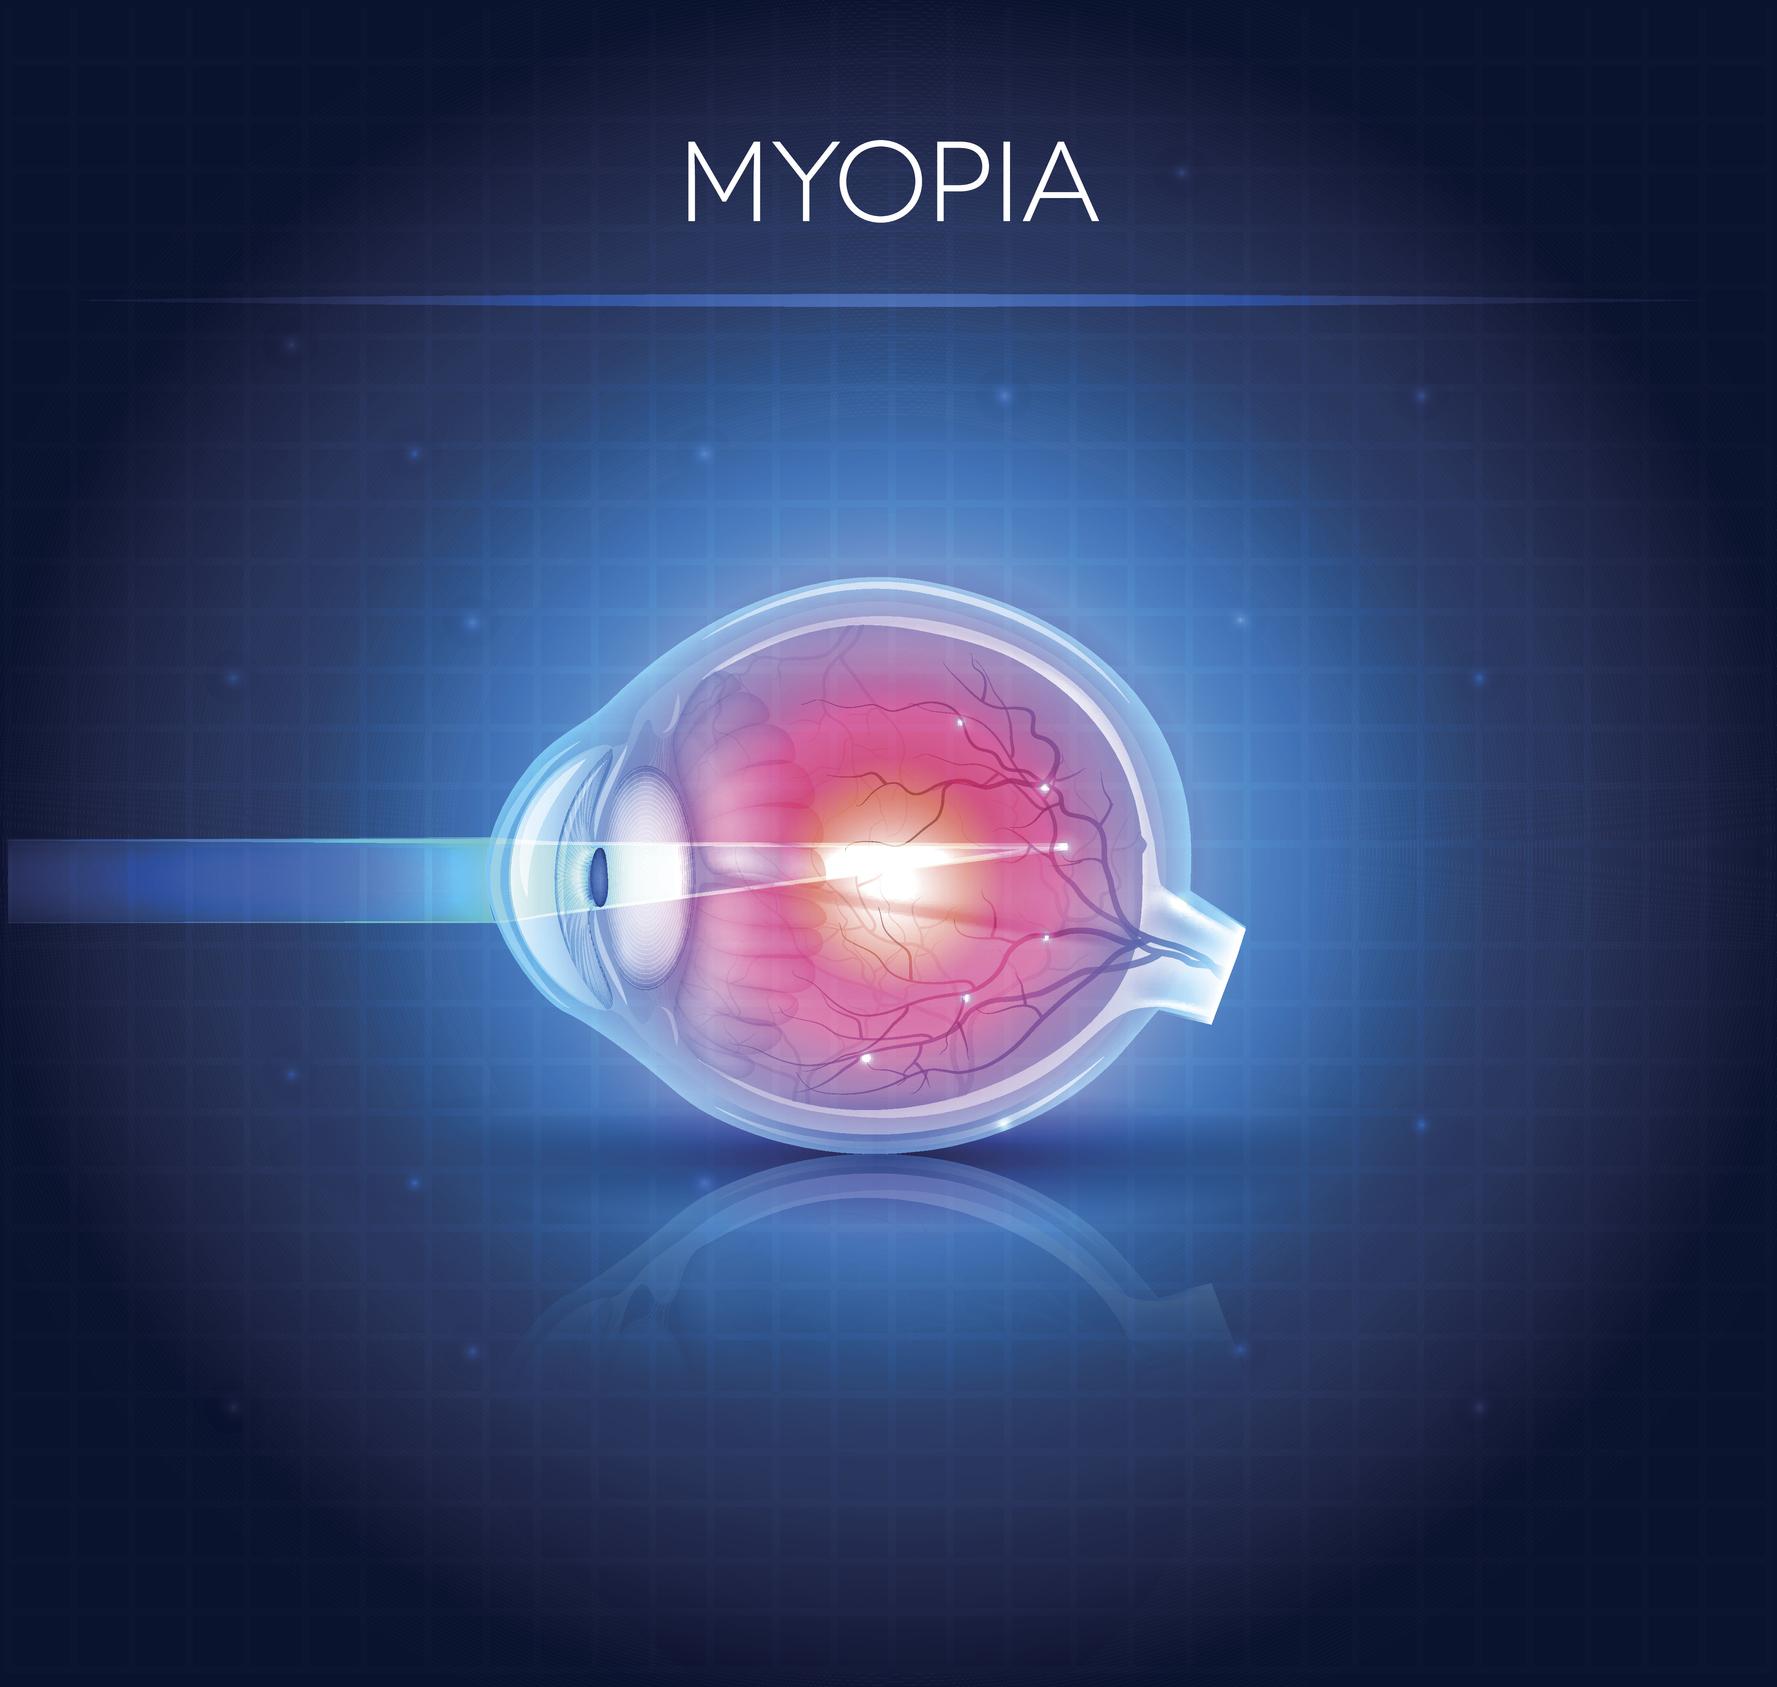 verificați miopia online